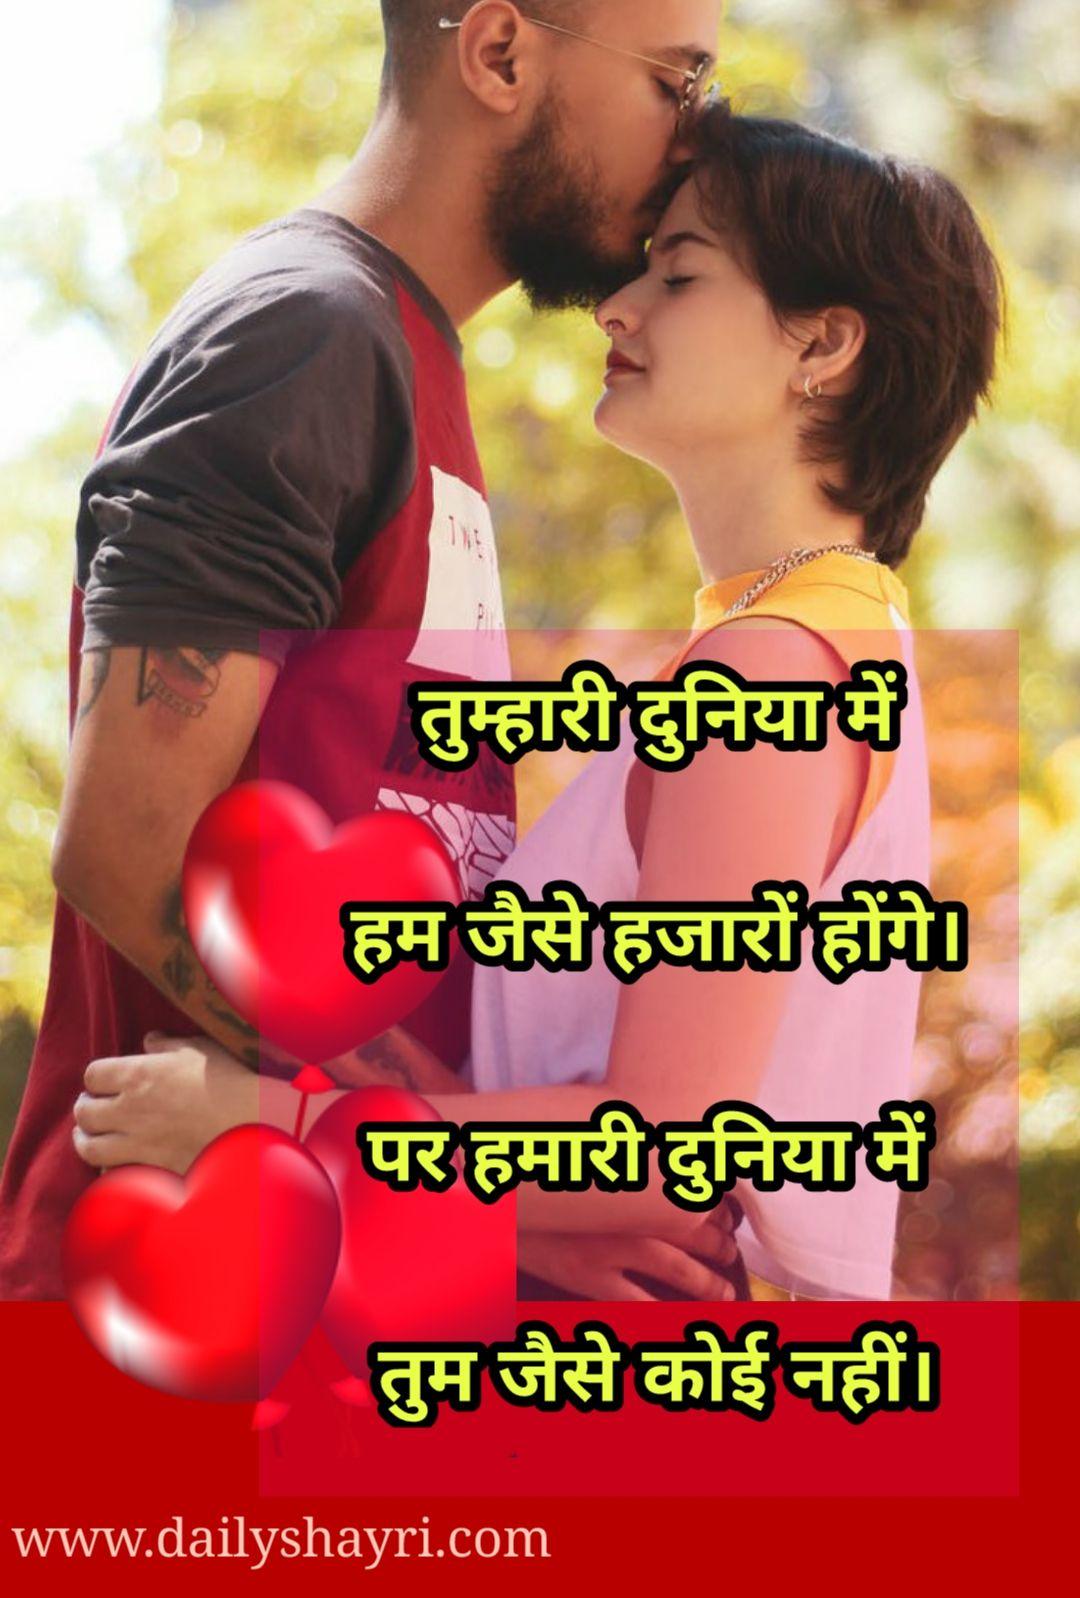 Hindi Love Shayari For Girlfriend Dailyshayri Com Cute Relationship Quotes Love Quotes Hindi Shayari Love